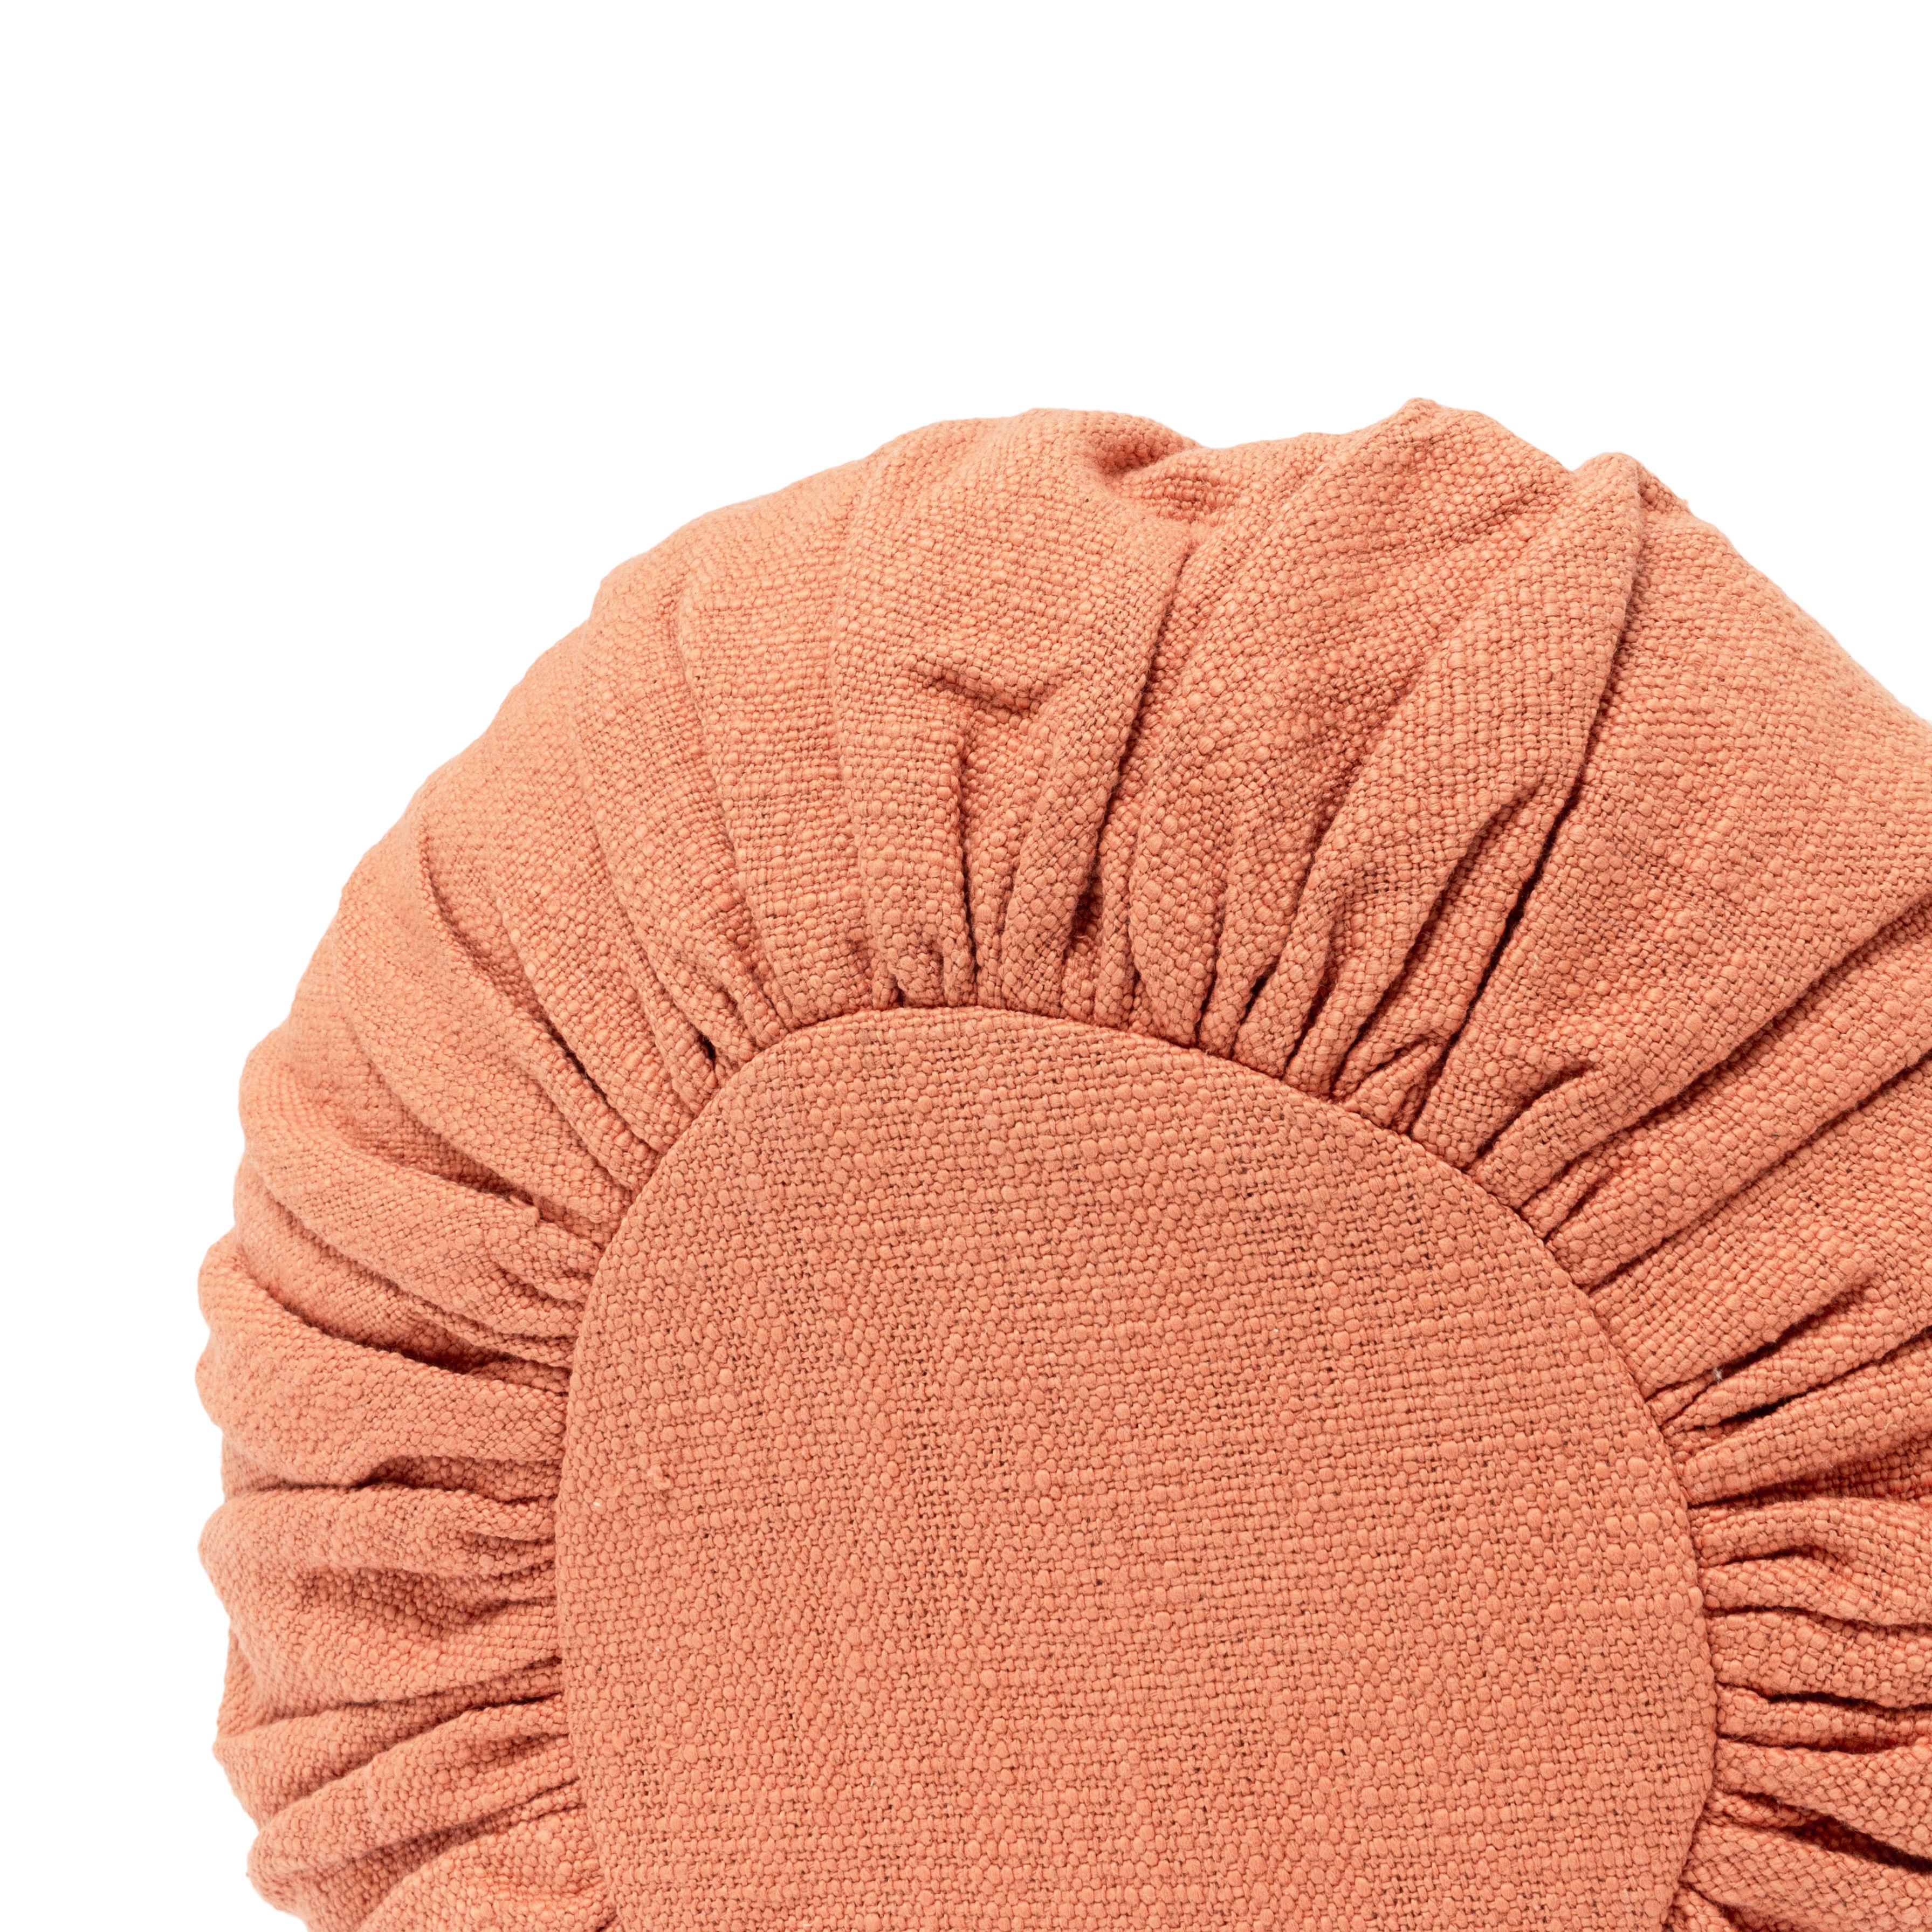 Rust Round Pillows